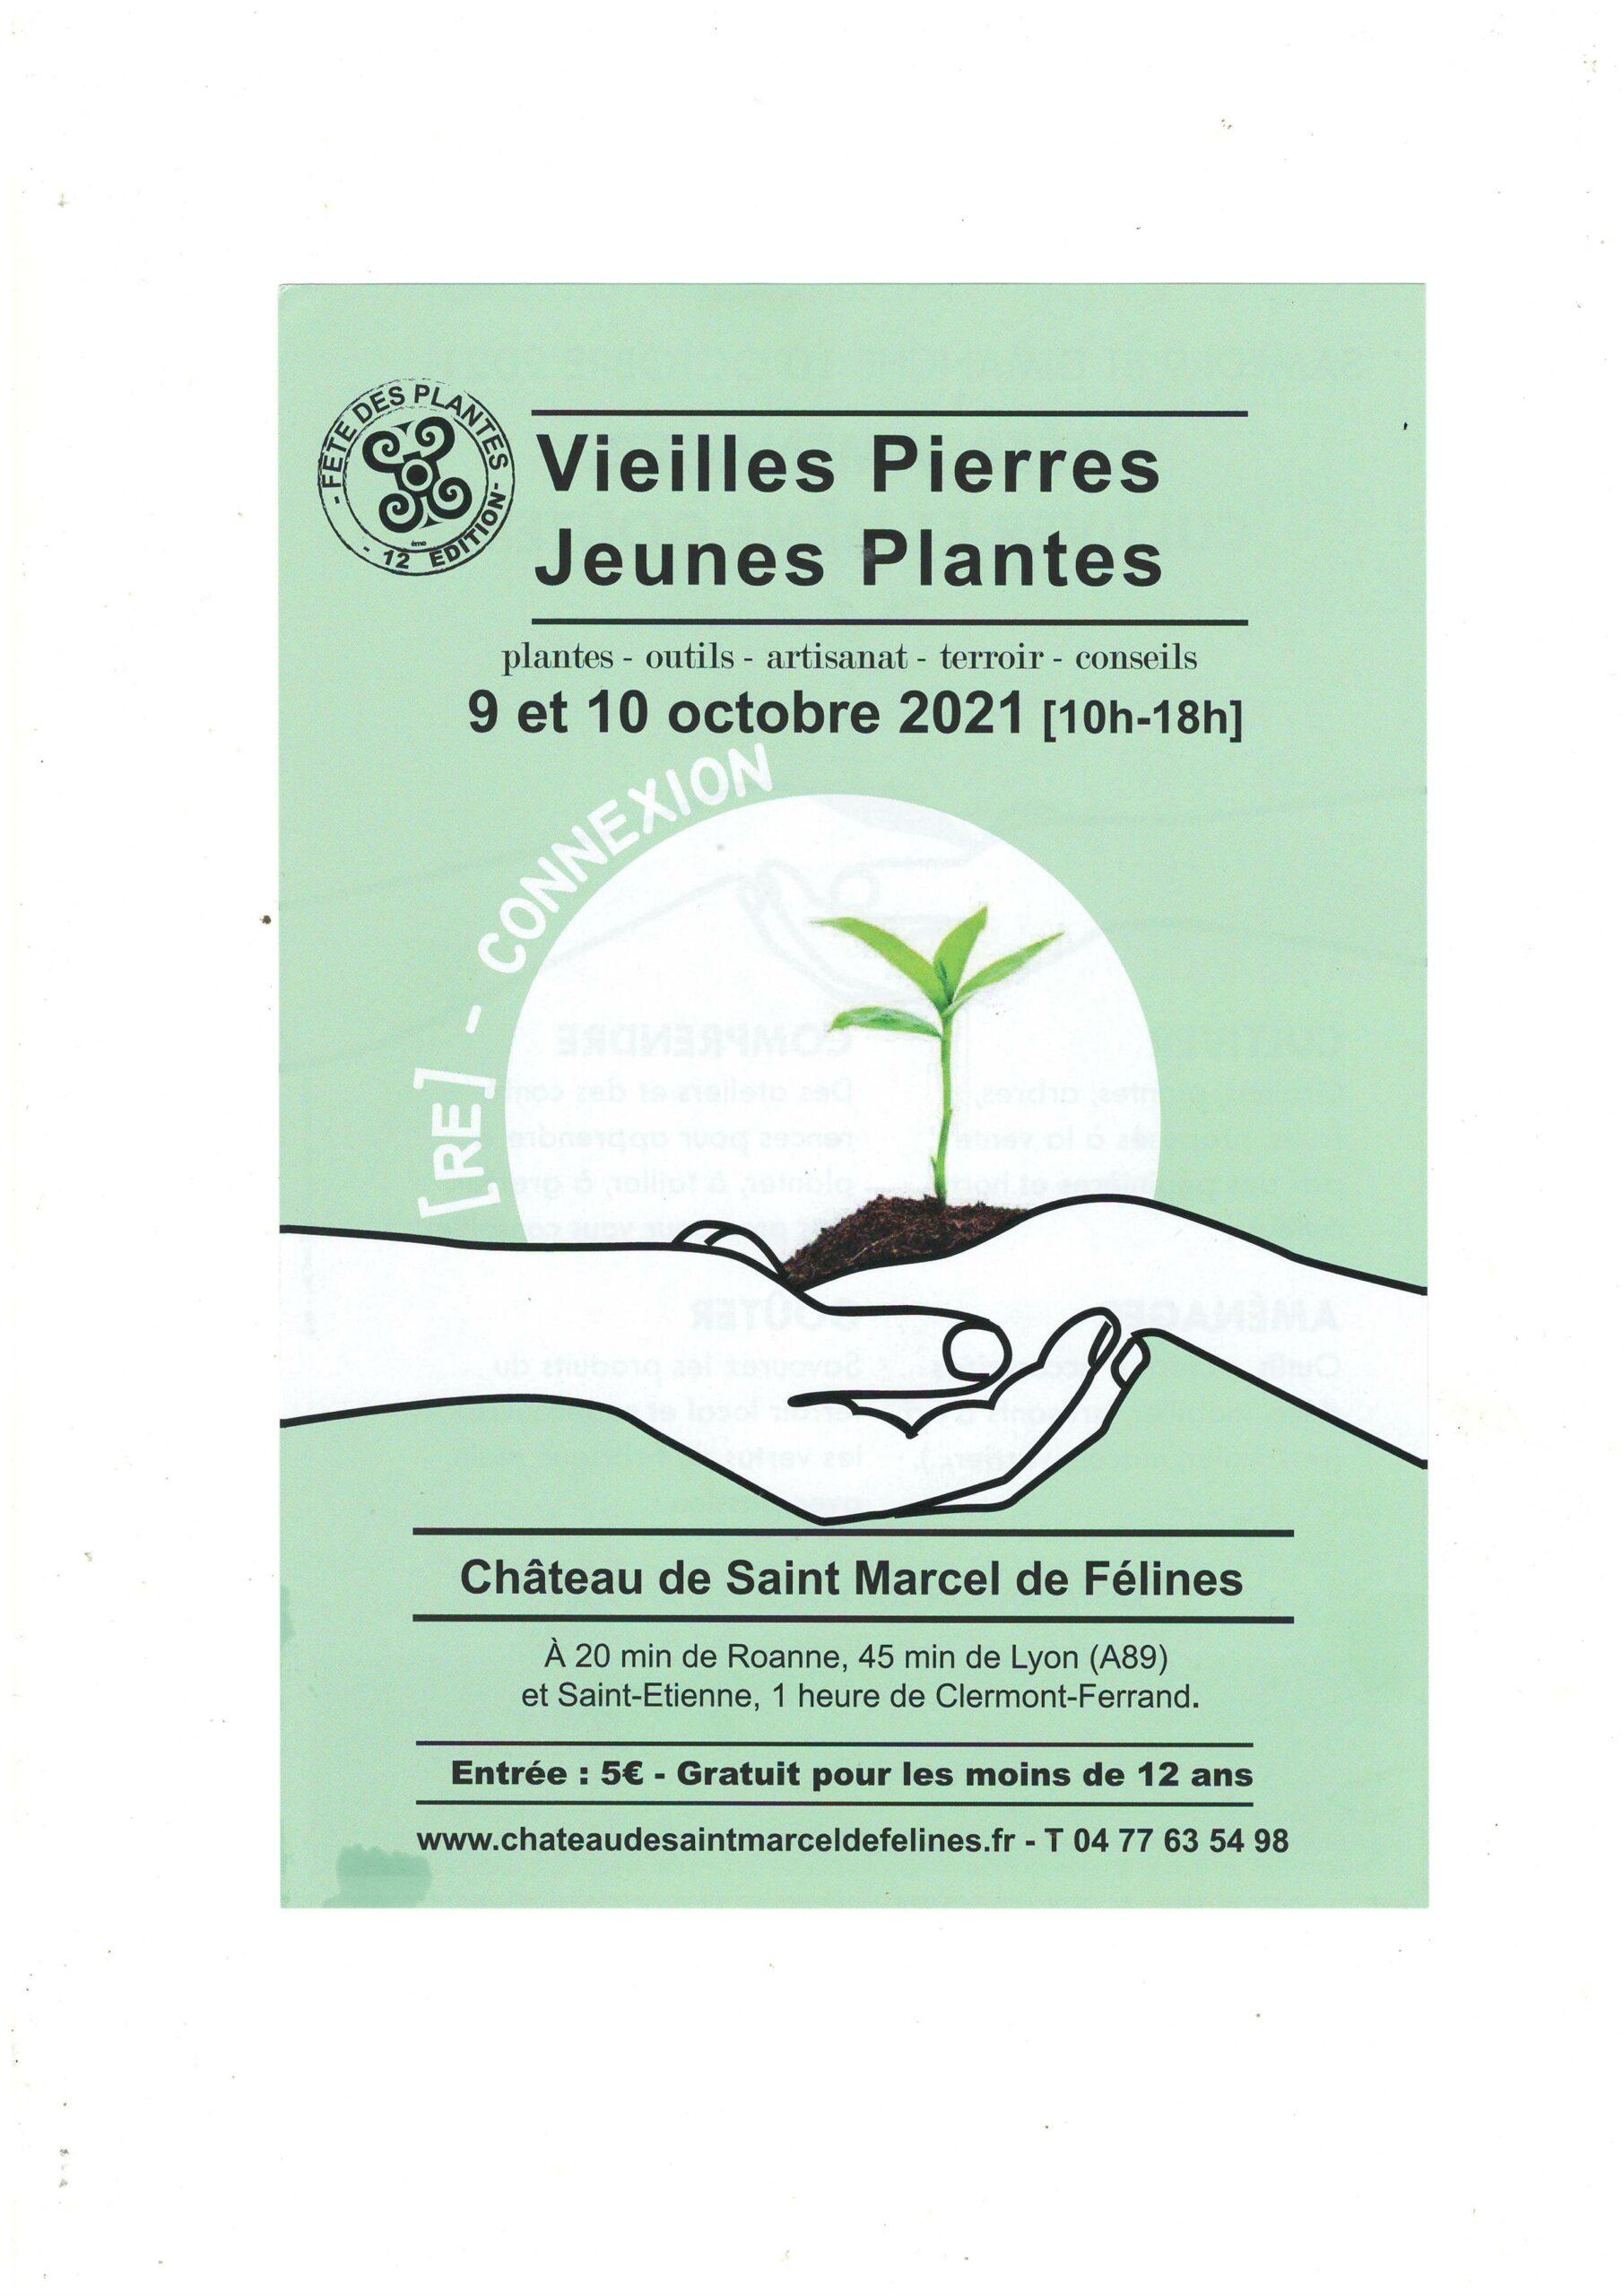 Vieilles Pierres Jeunes Plantes